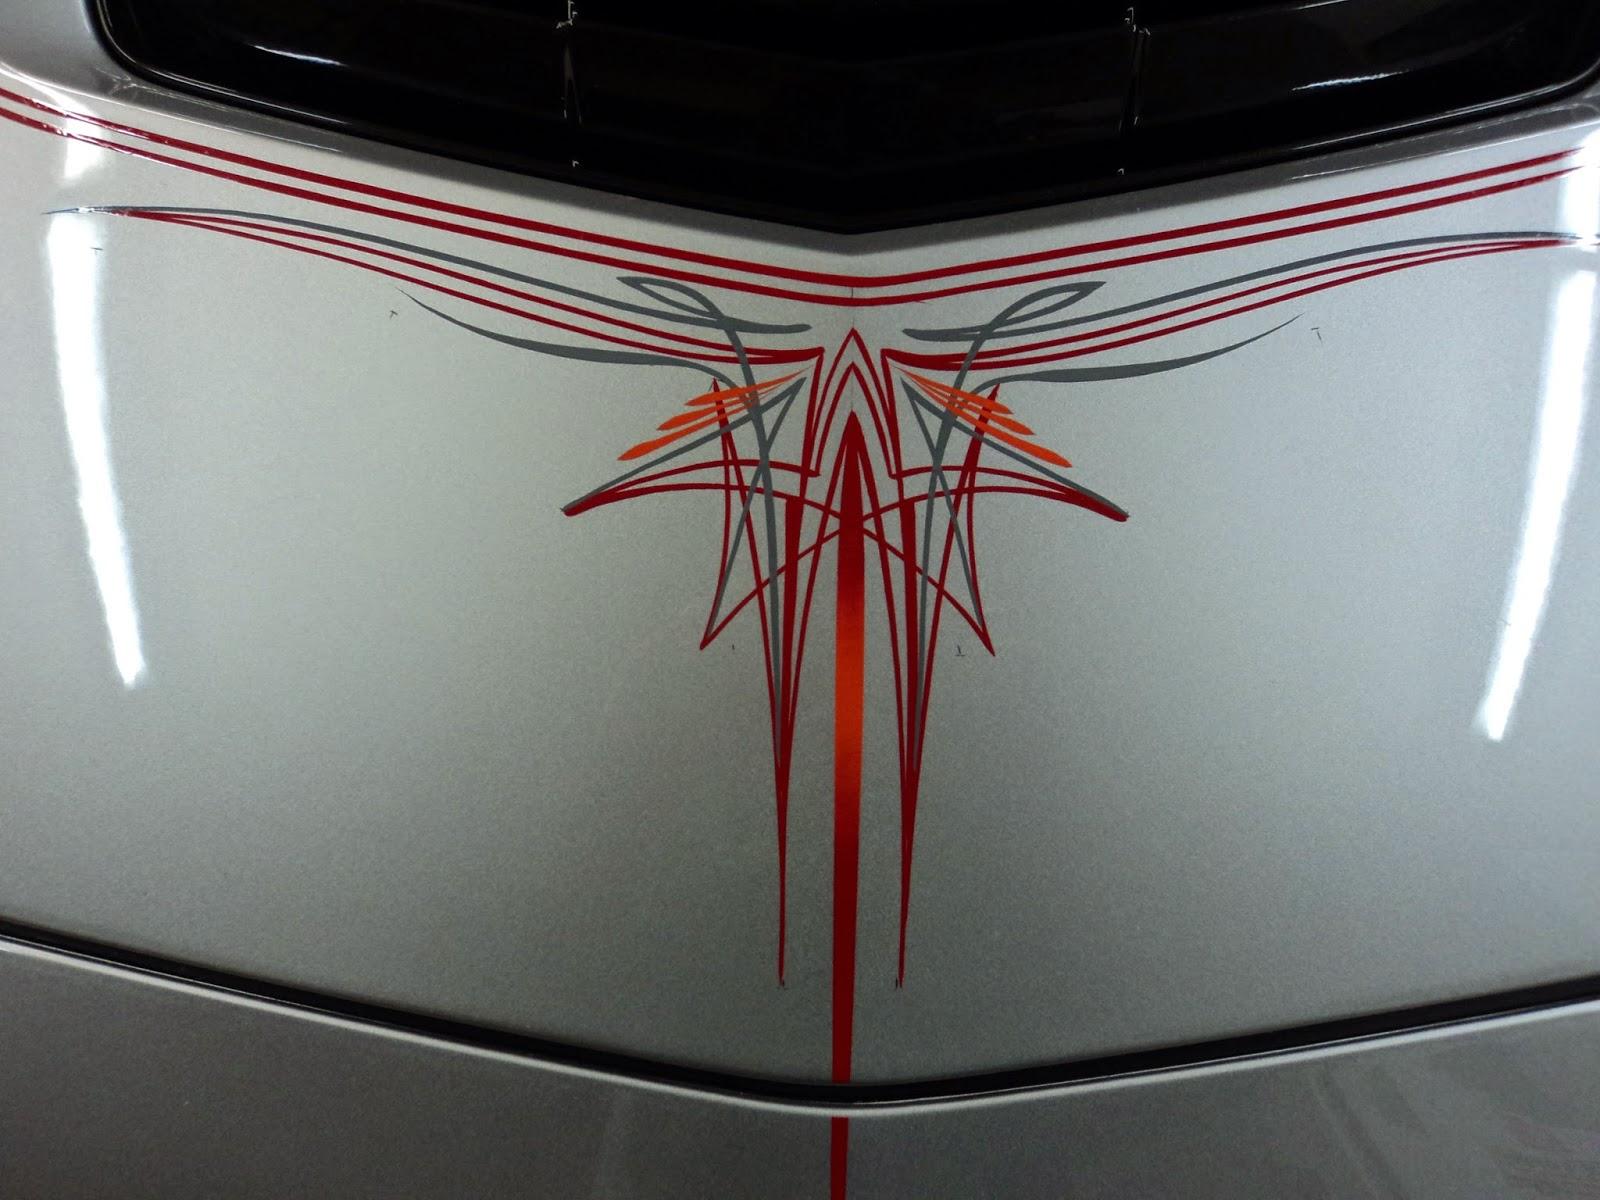 Dennis Day Designs Lettering Pinstriping Murals Pinstriping